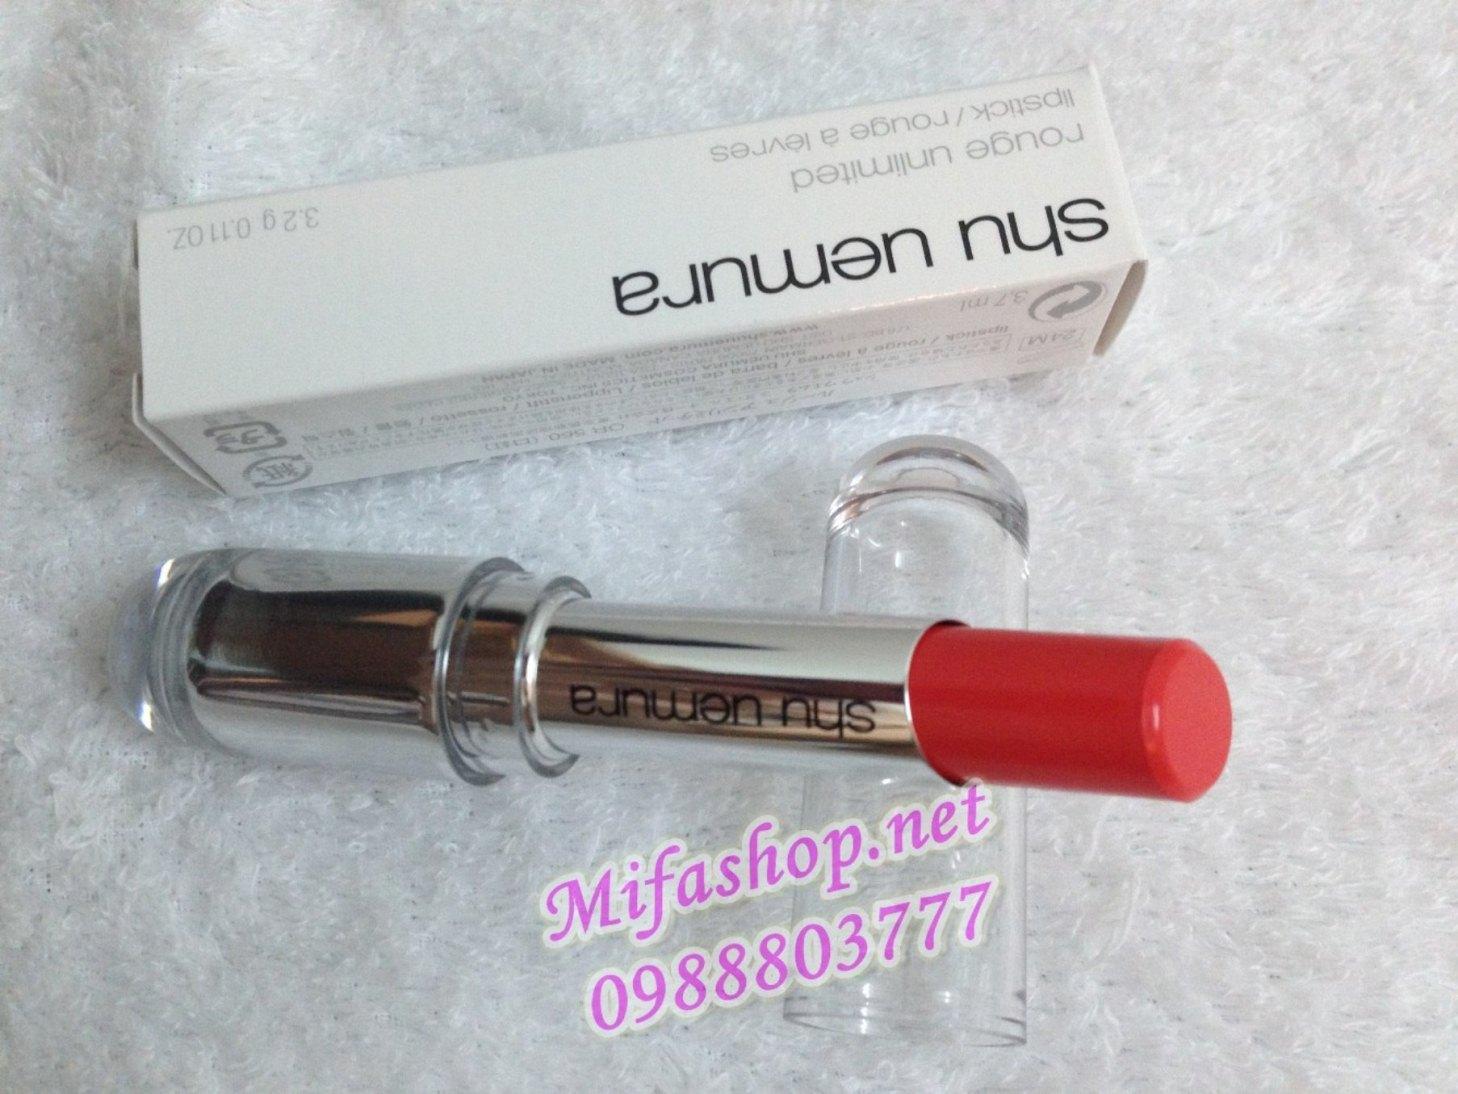 Son môi Shu Uemura 560